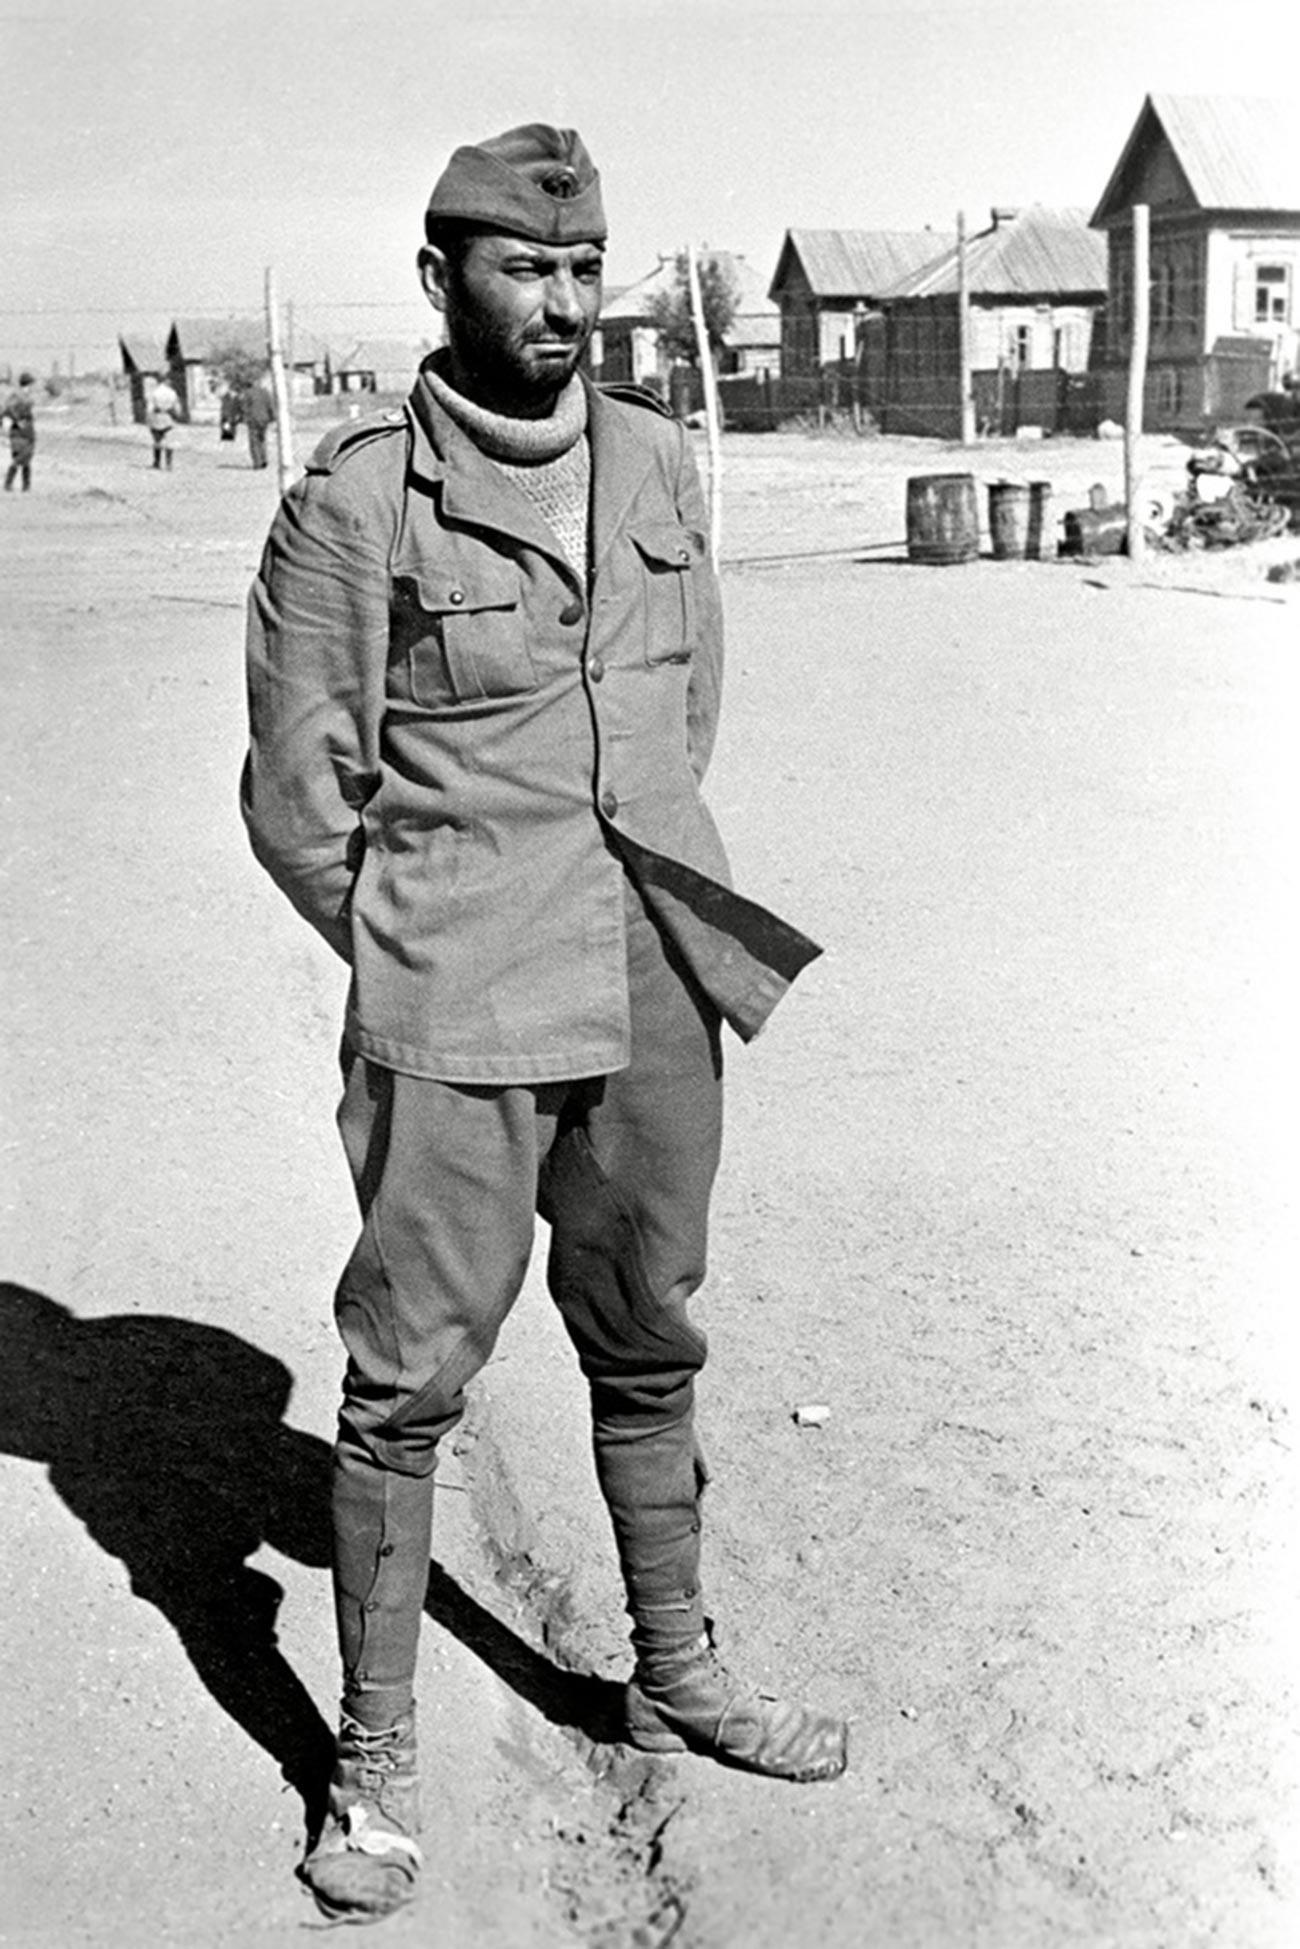 Romunski vojni ujetnik